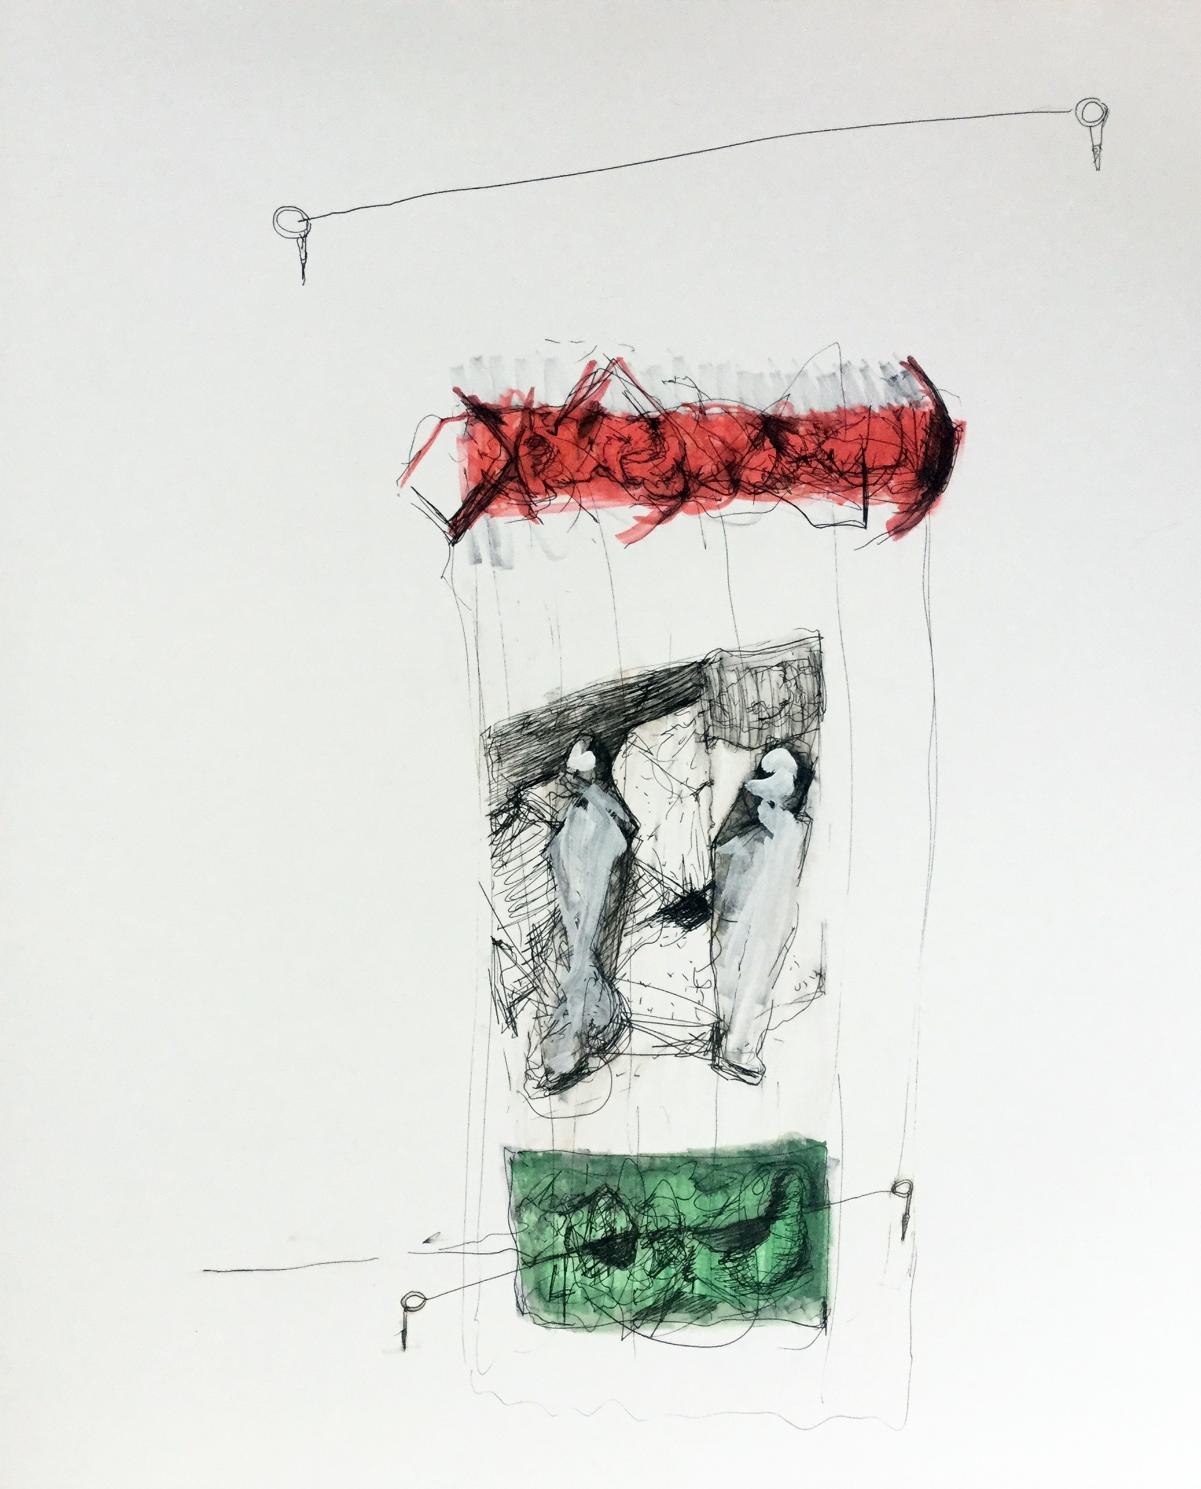 Untitled (612 2/16)